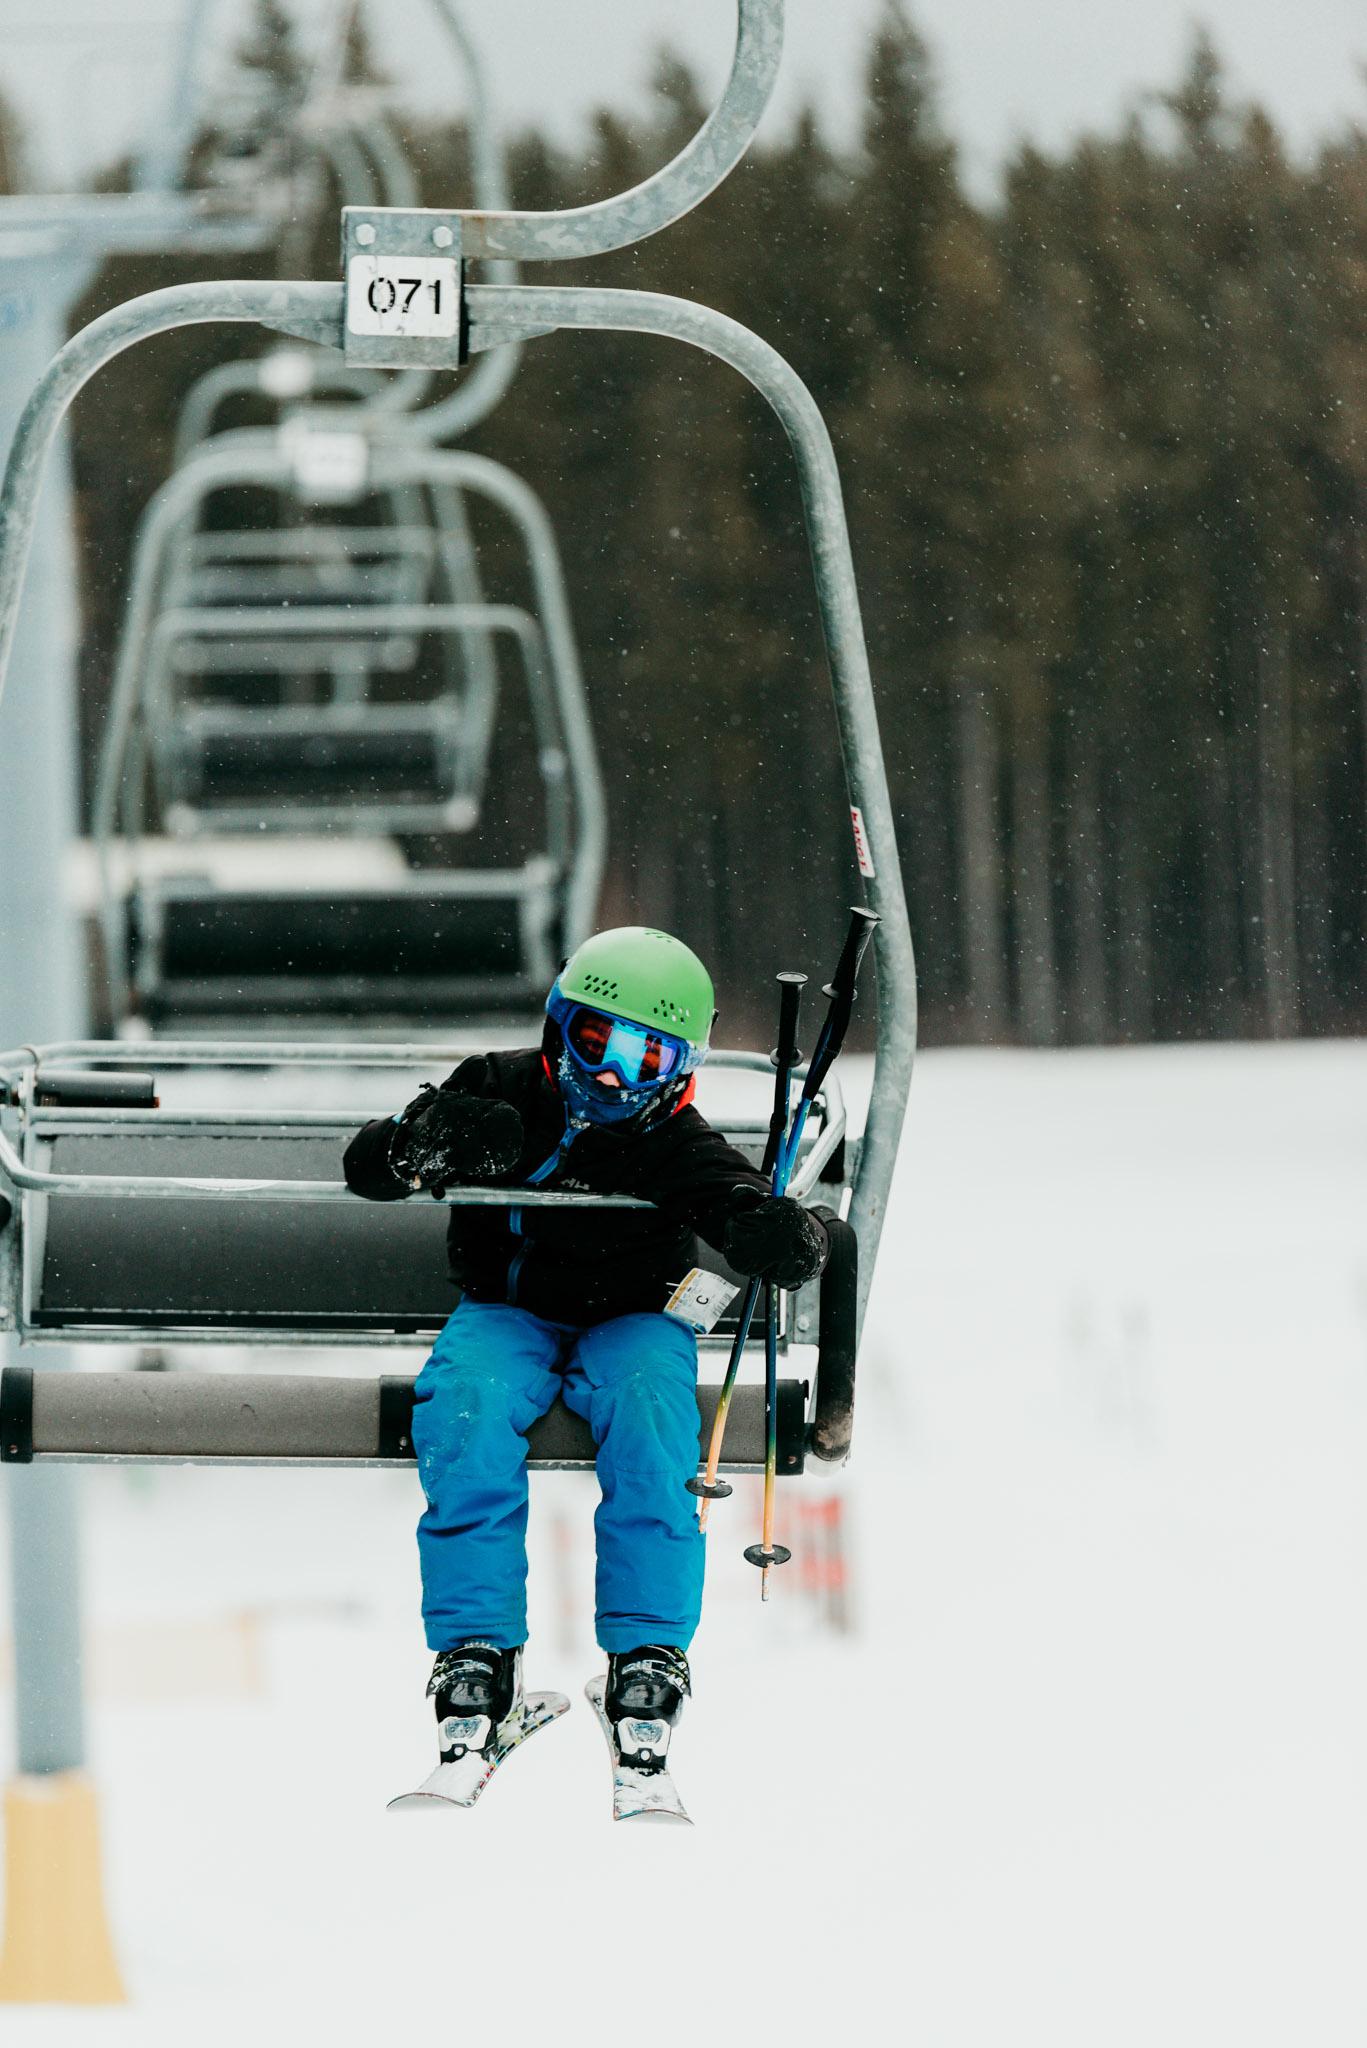 Chelsea Czibere - January 19, 2018 - Nakiska Ski Resort-25.jpg